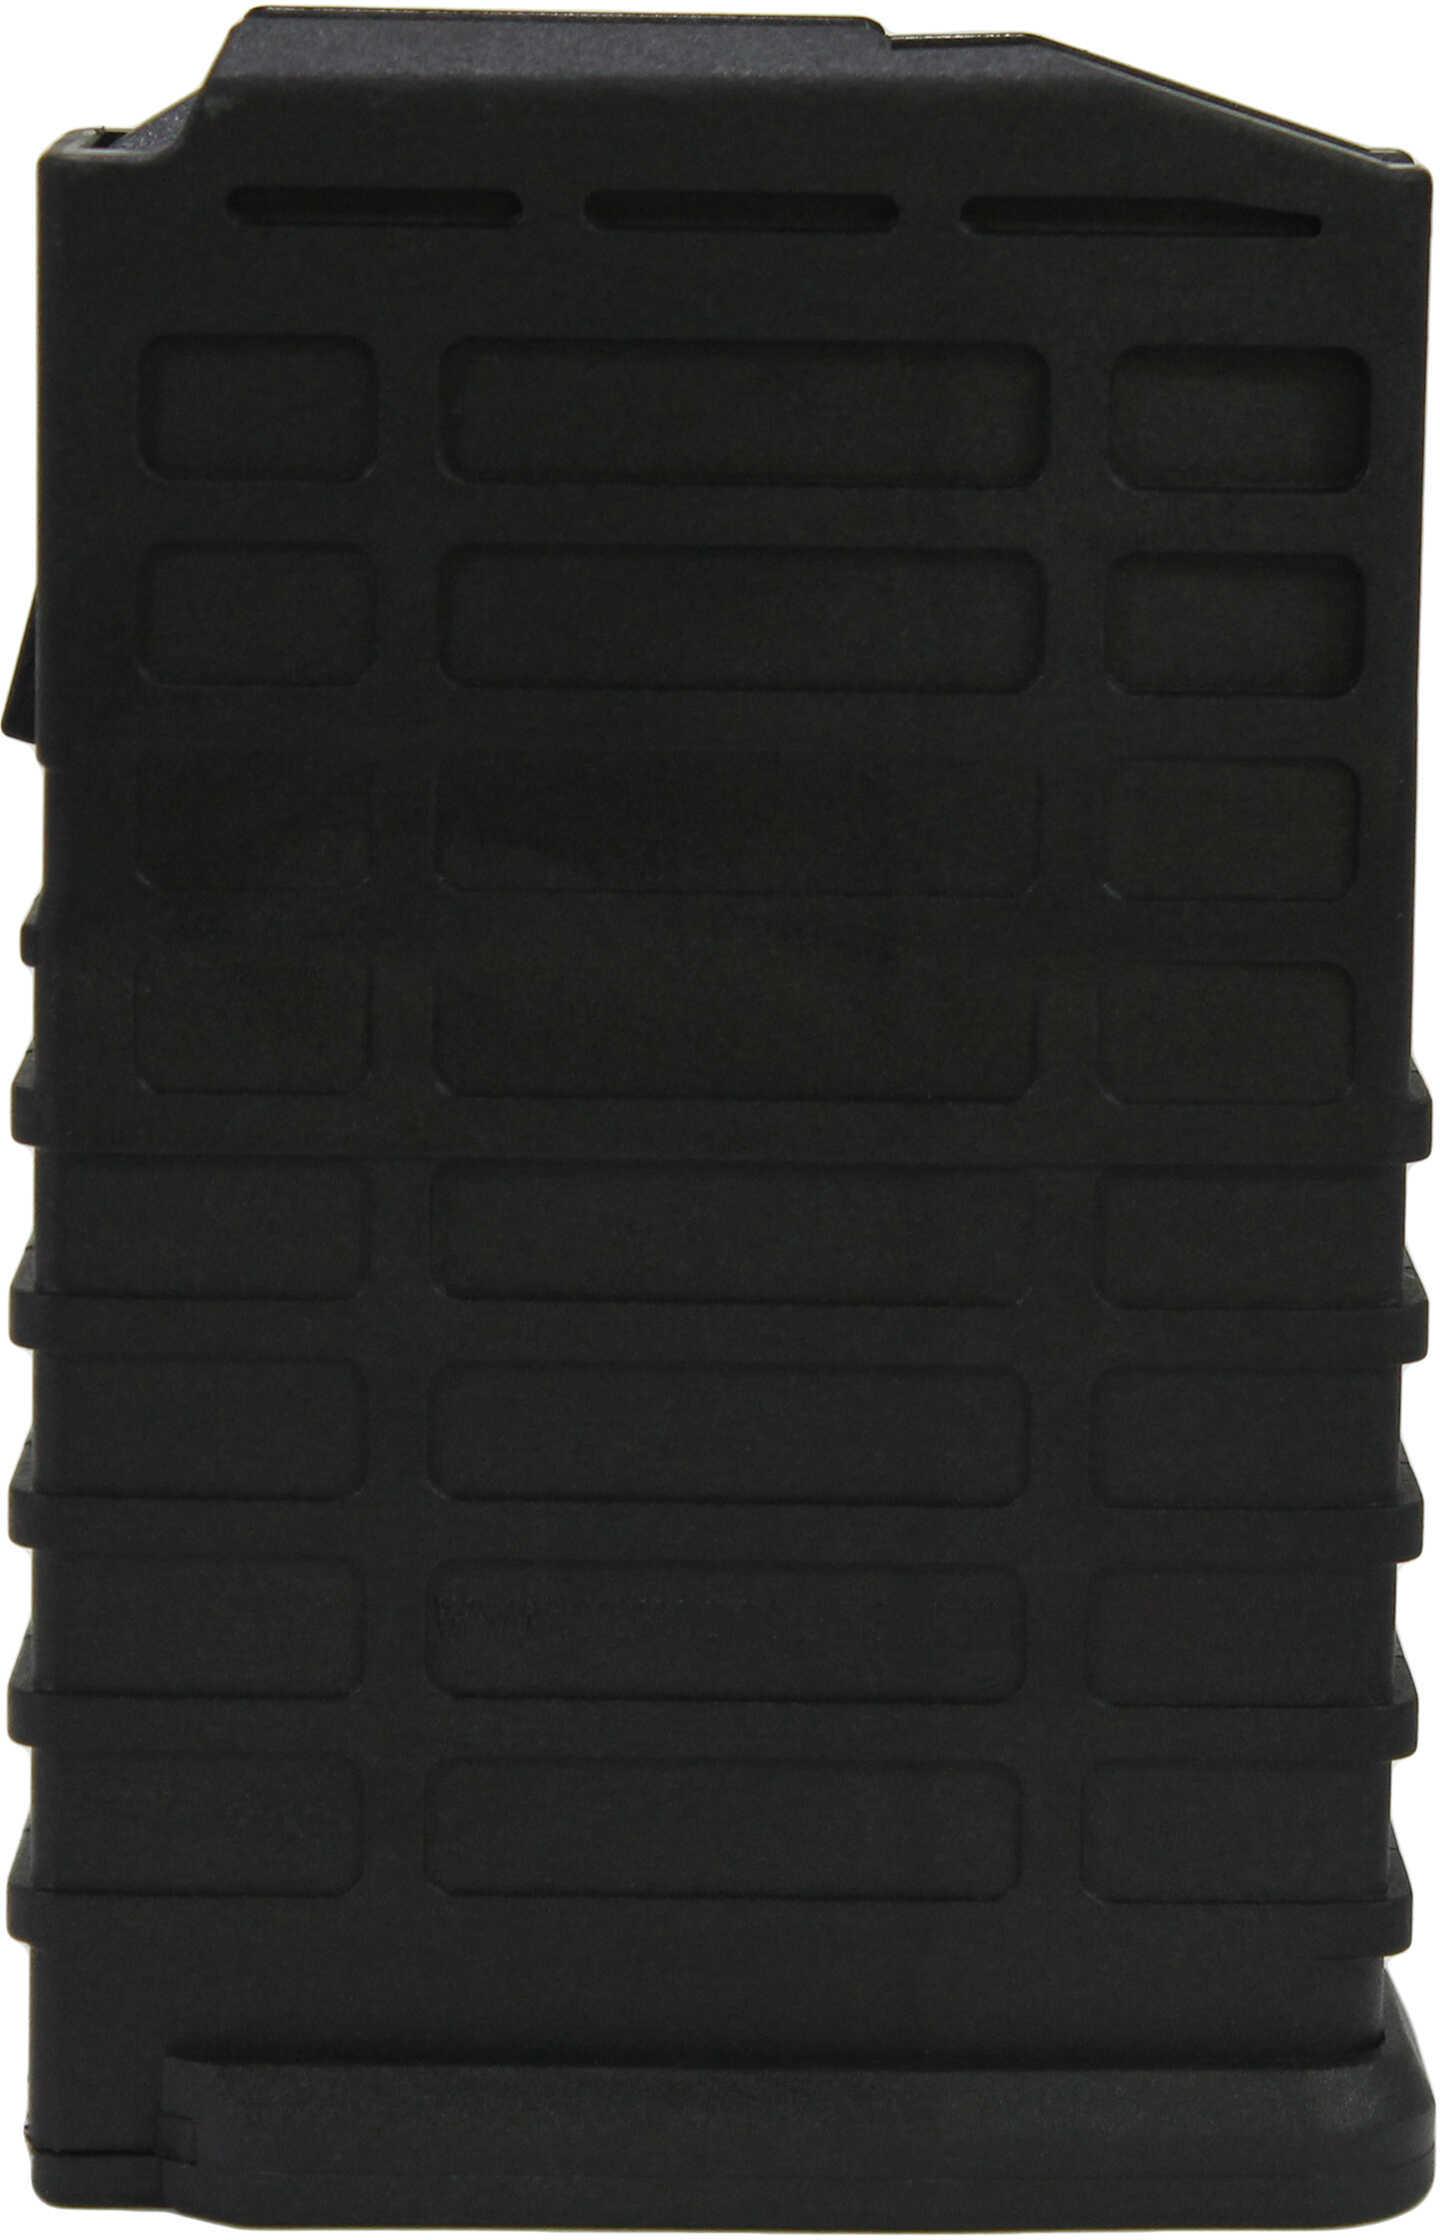 ProMag Ruger® Scout, .308 Caliber, 10-Round Magazine, Black Polymer Md: RUG 22